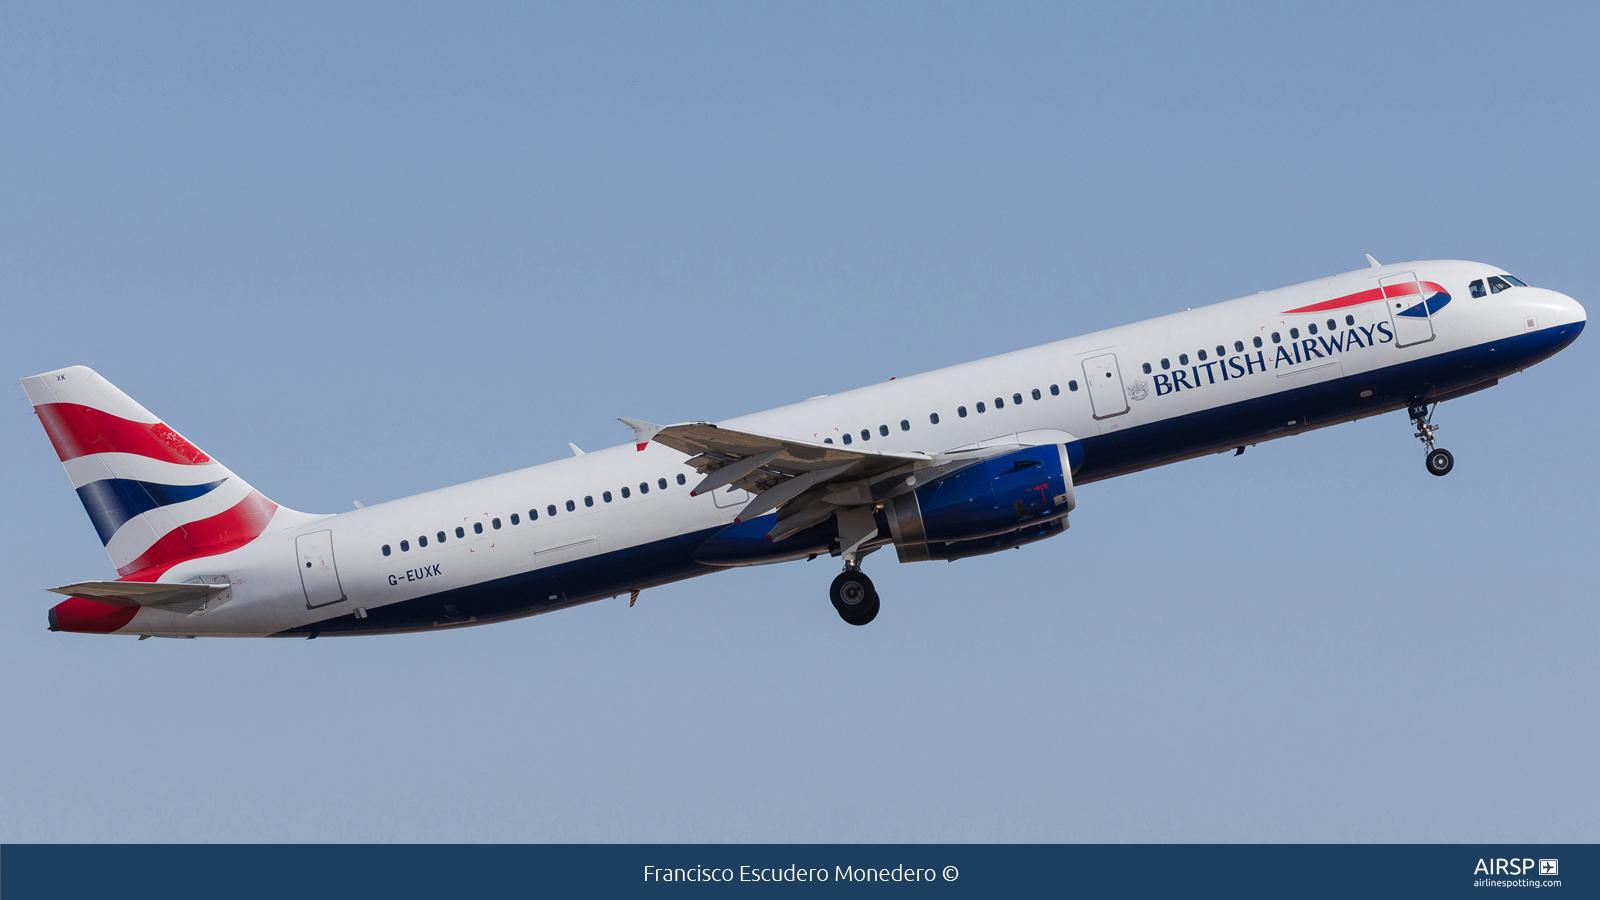 British Airways  Airbus A321  G-EUXK